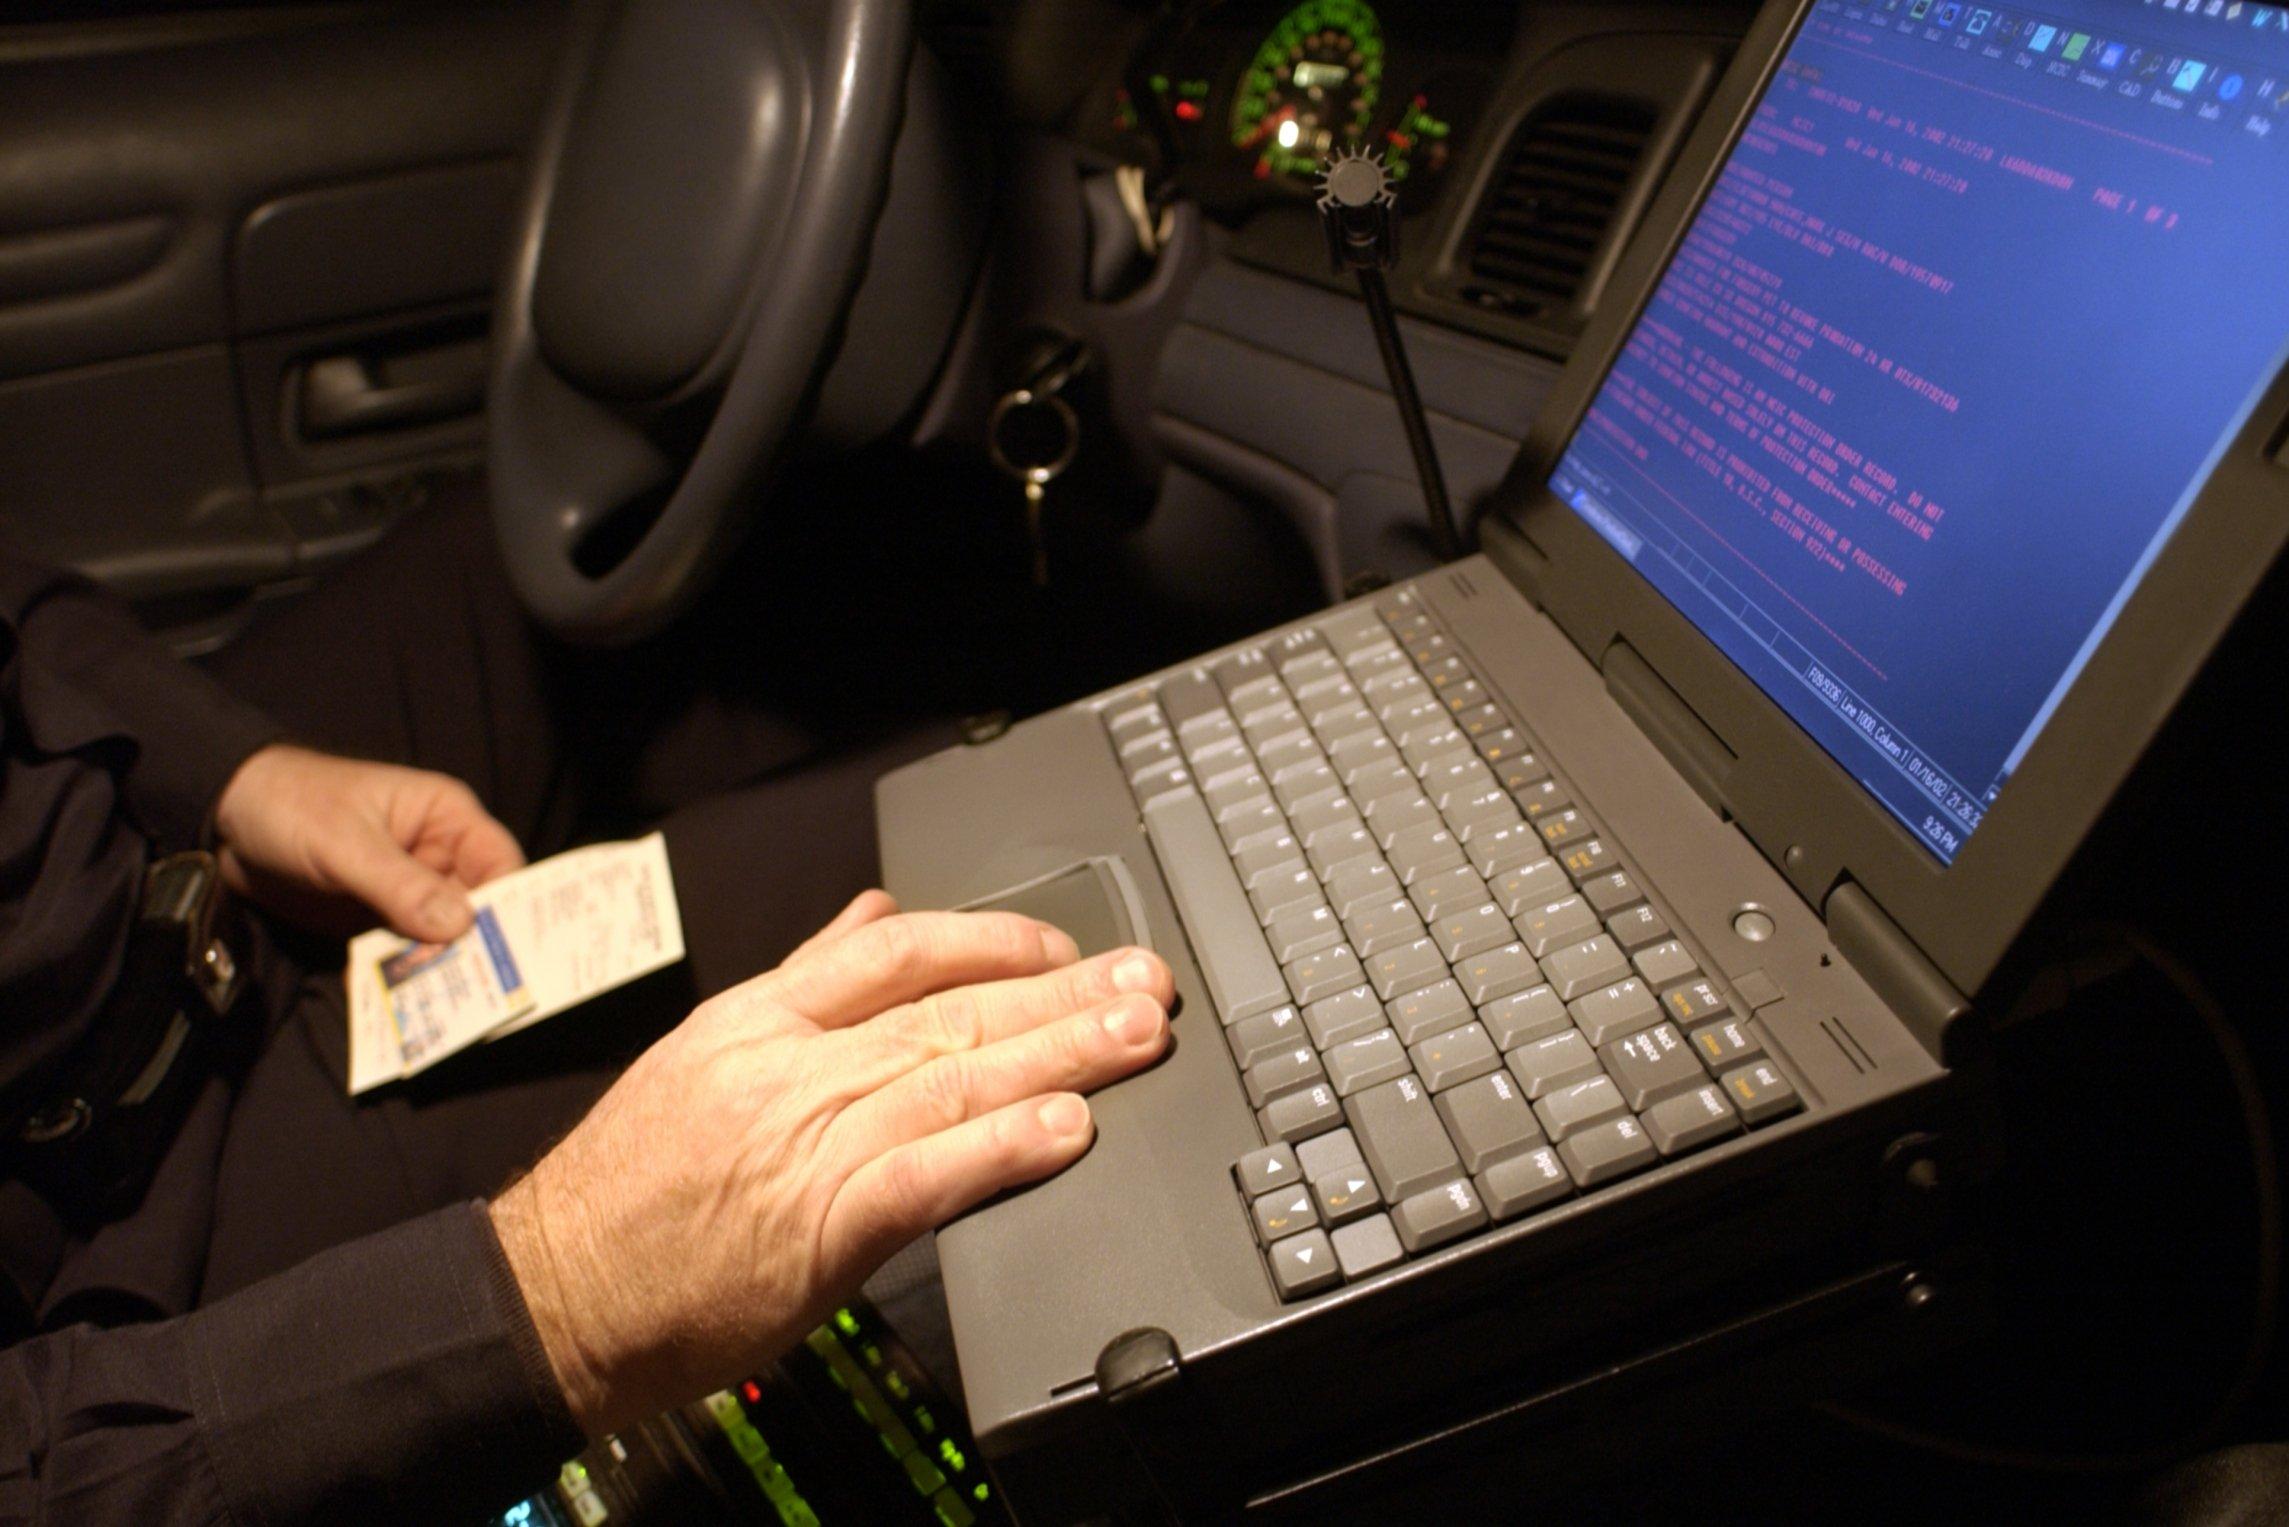 ticket - suspended license